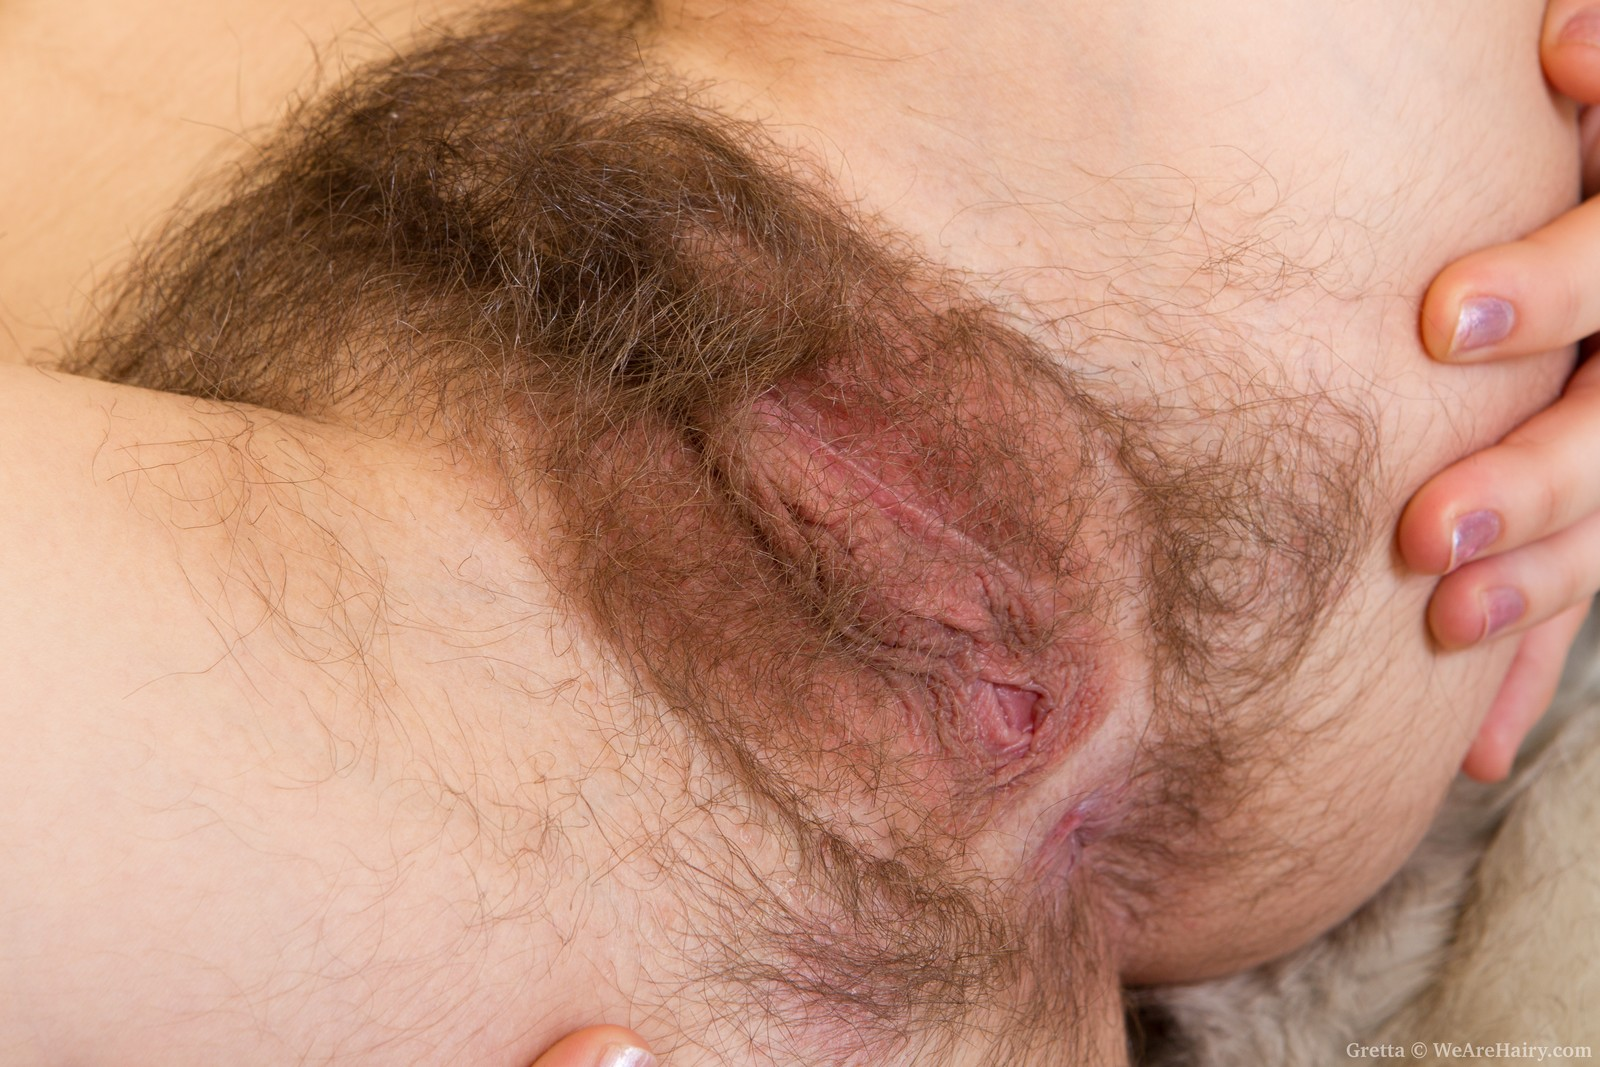 sex offender paroled to michgan